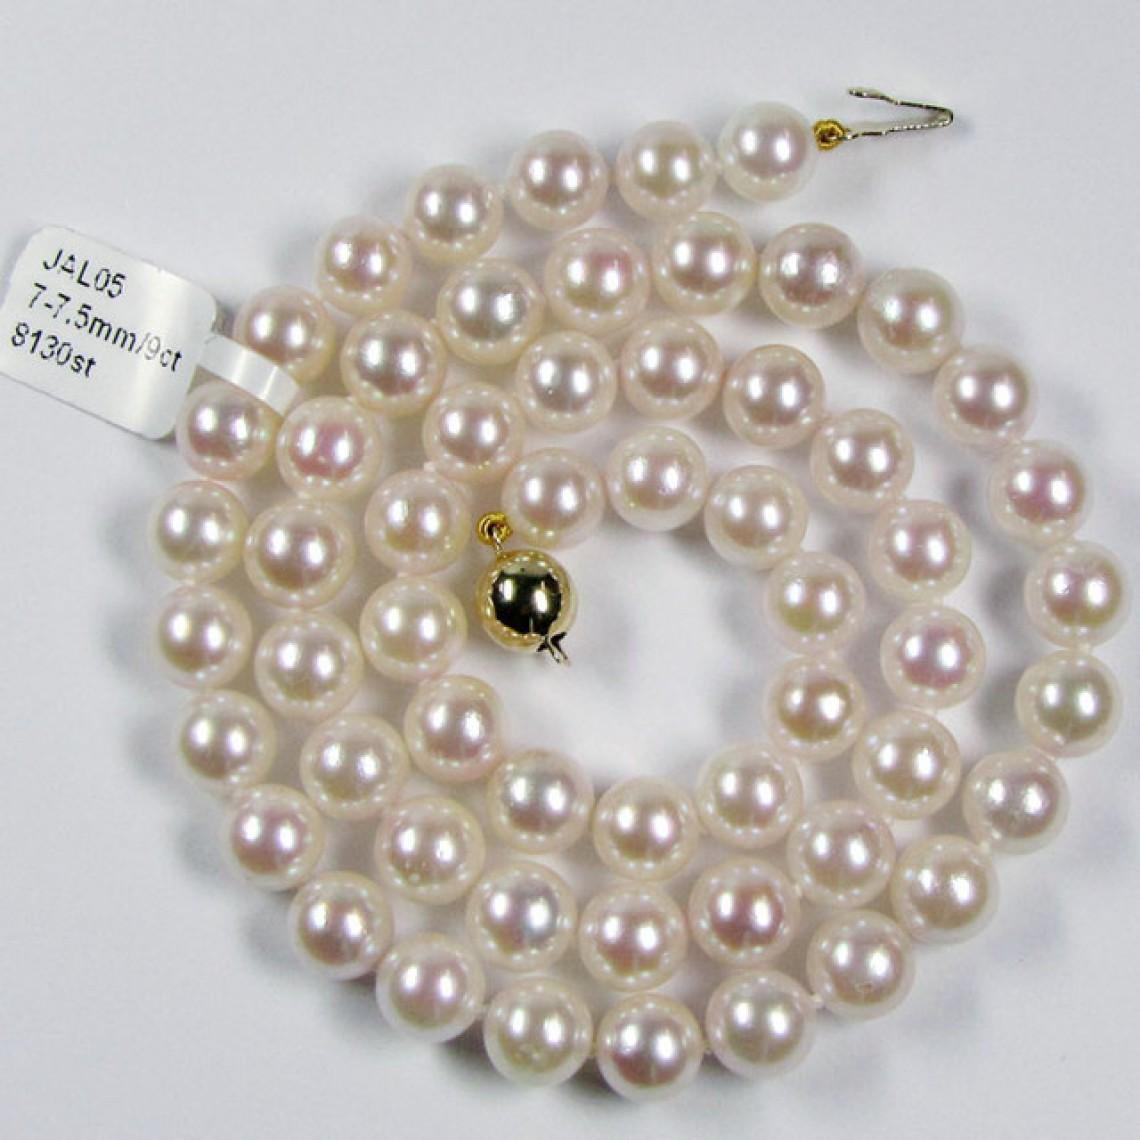 types of pearls - akoya pearls